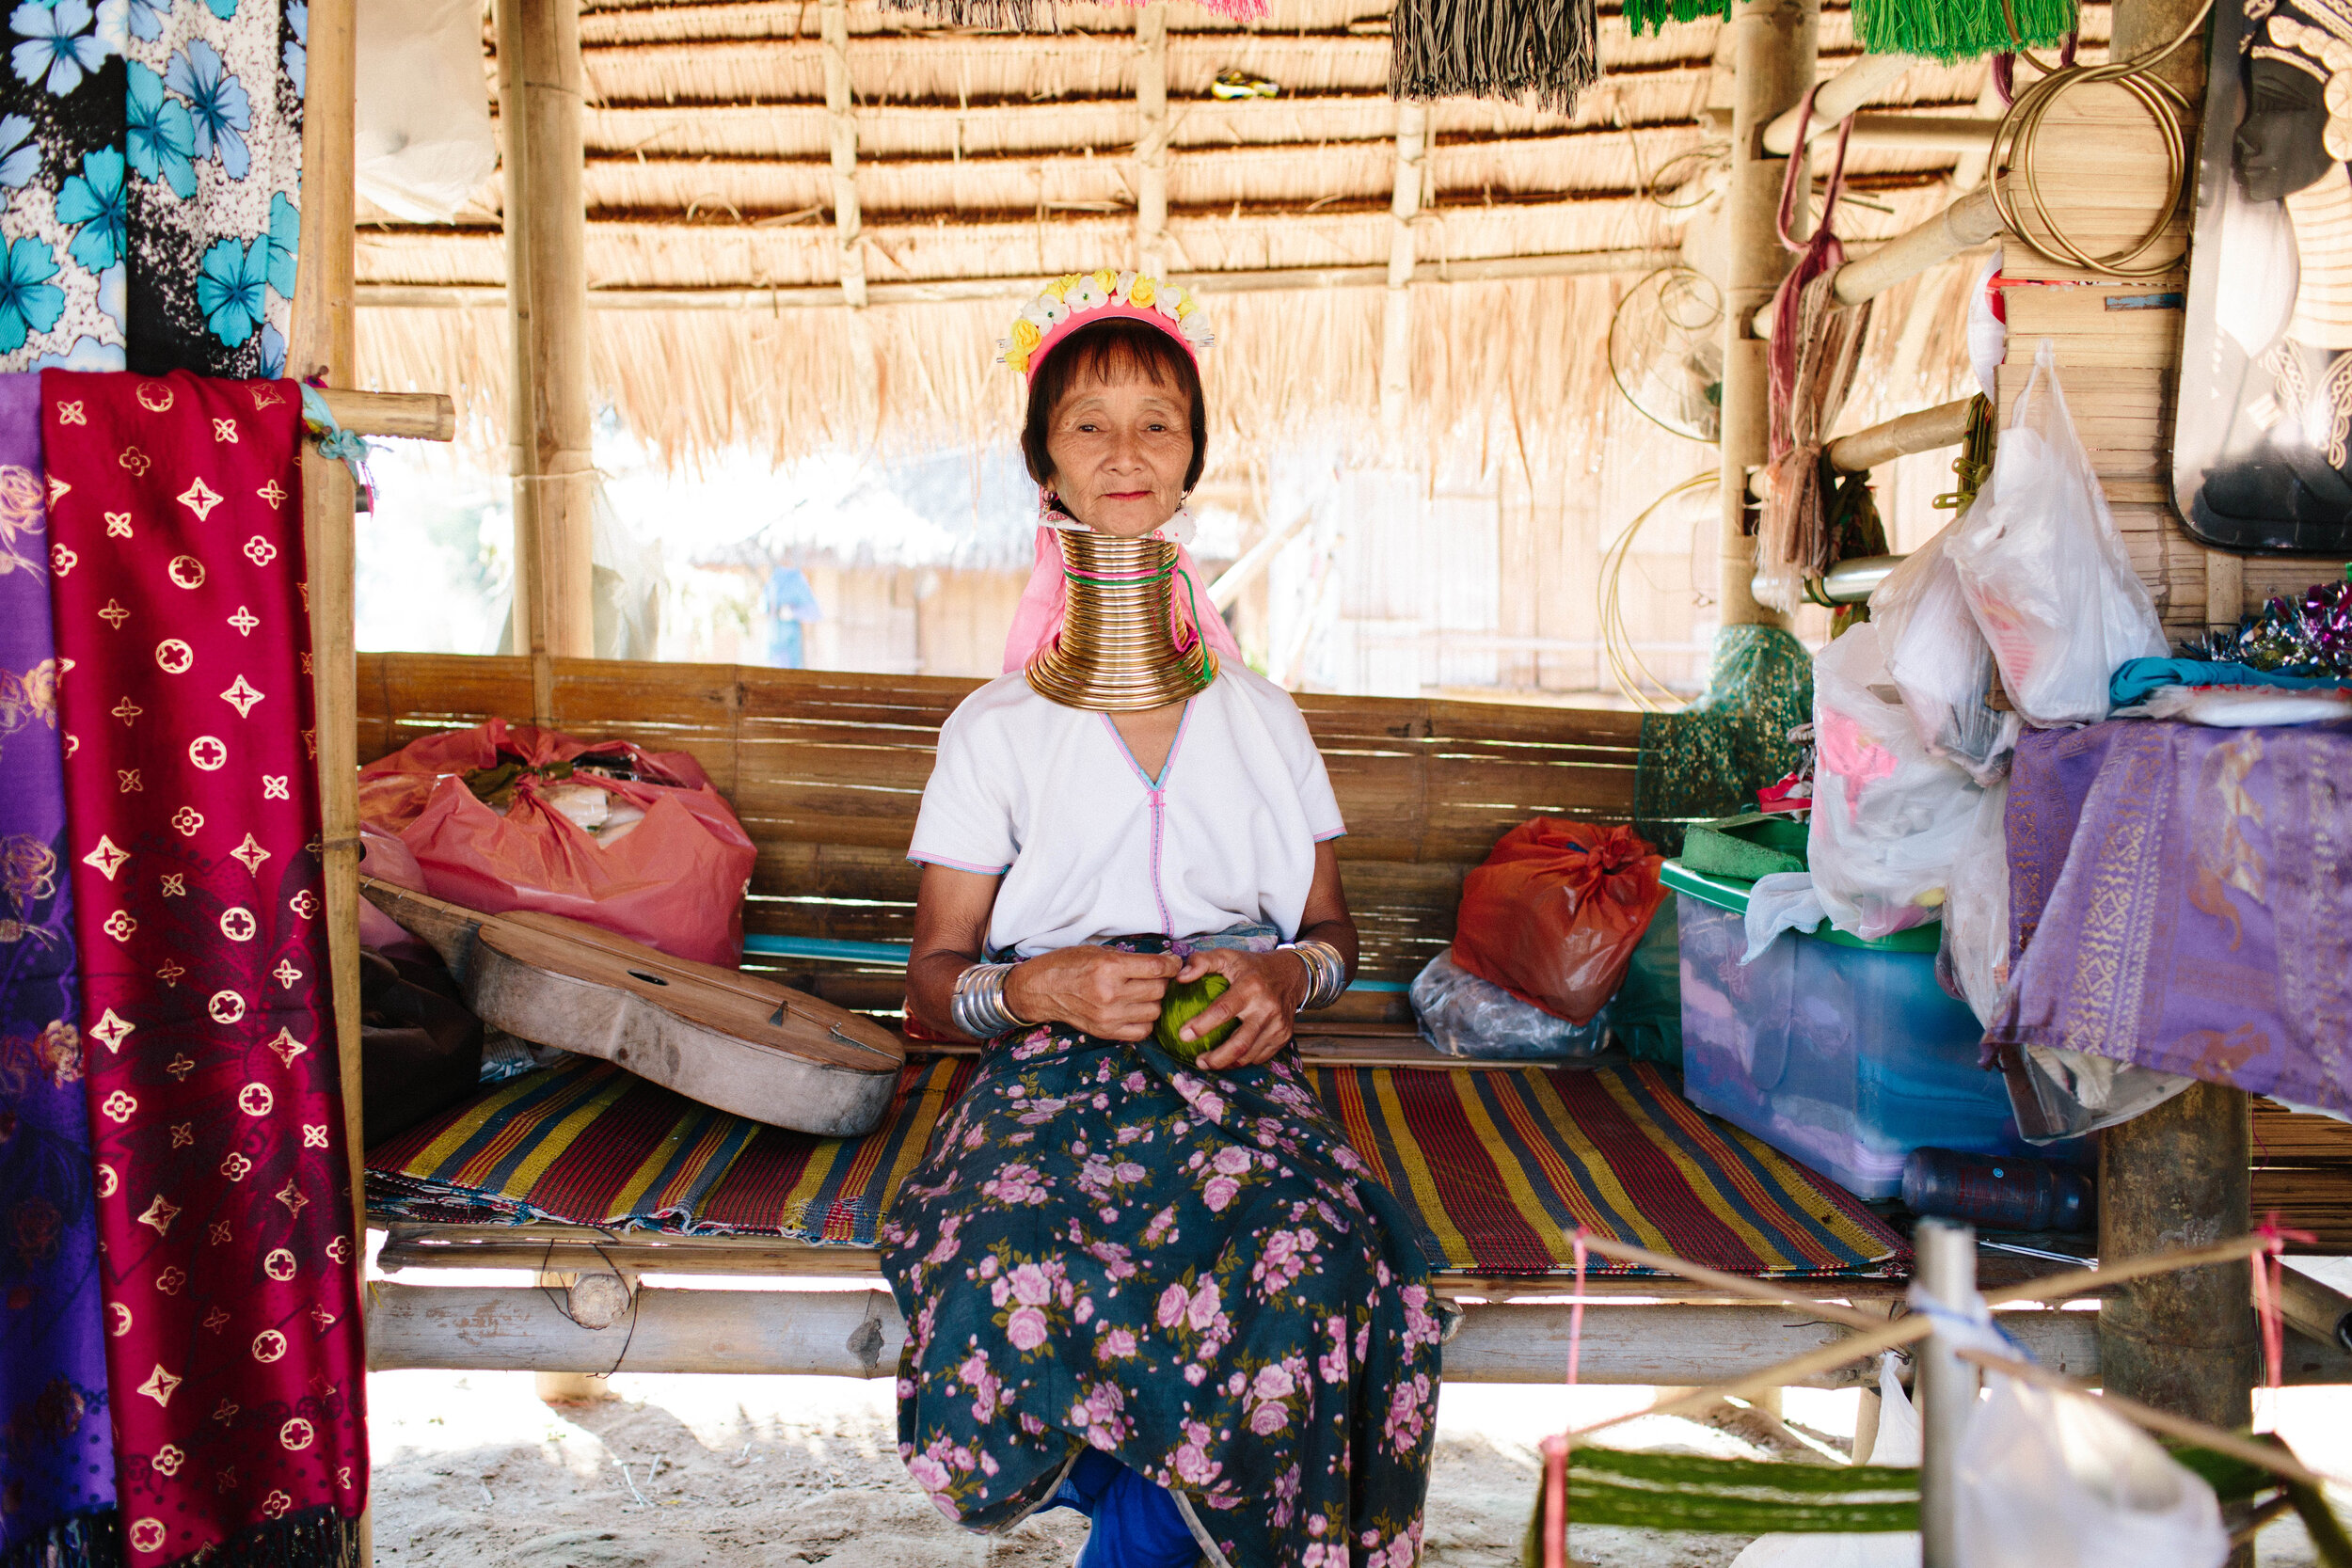 passeio arrependida tailandia mulheres girafa